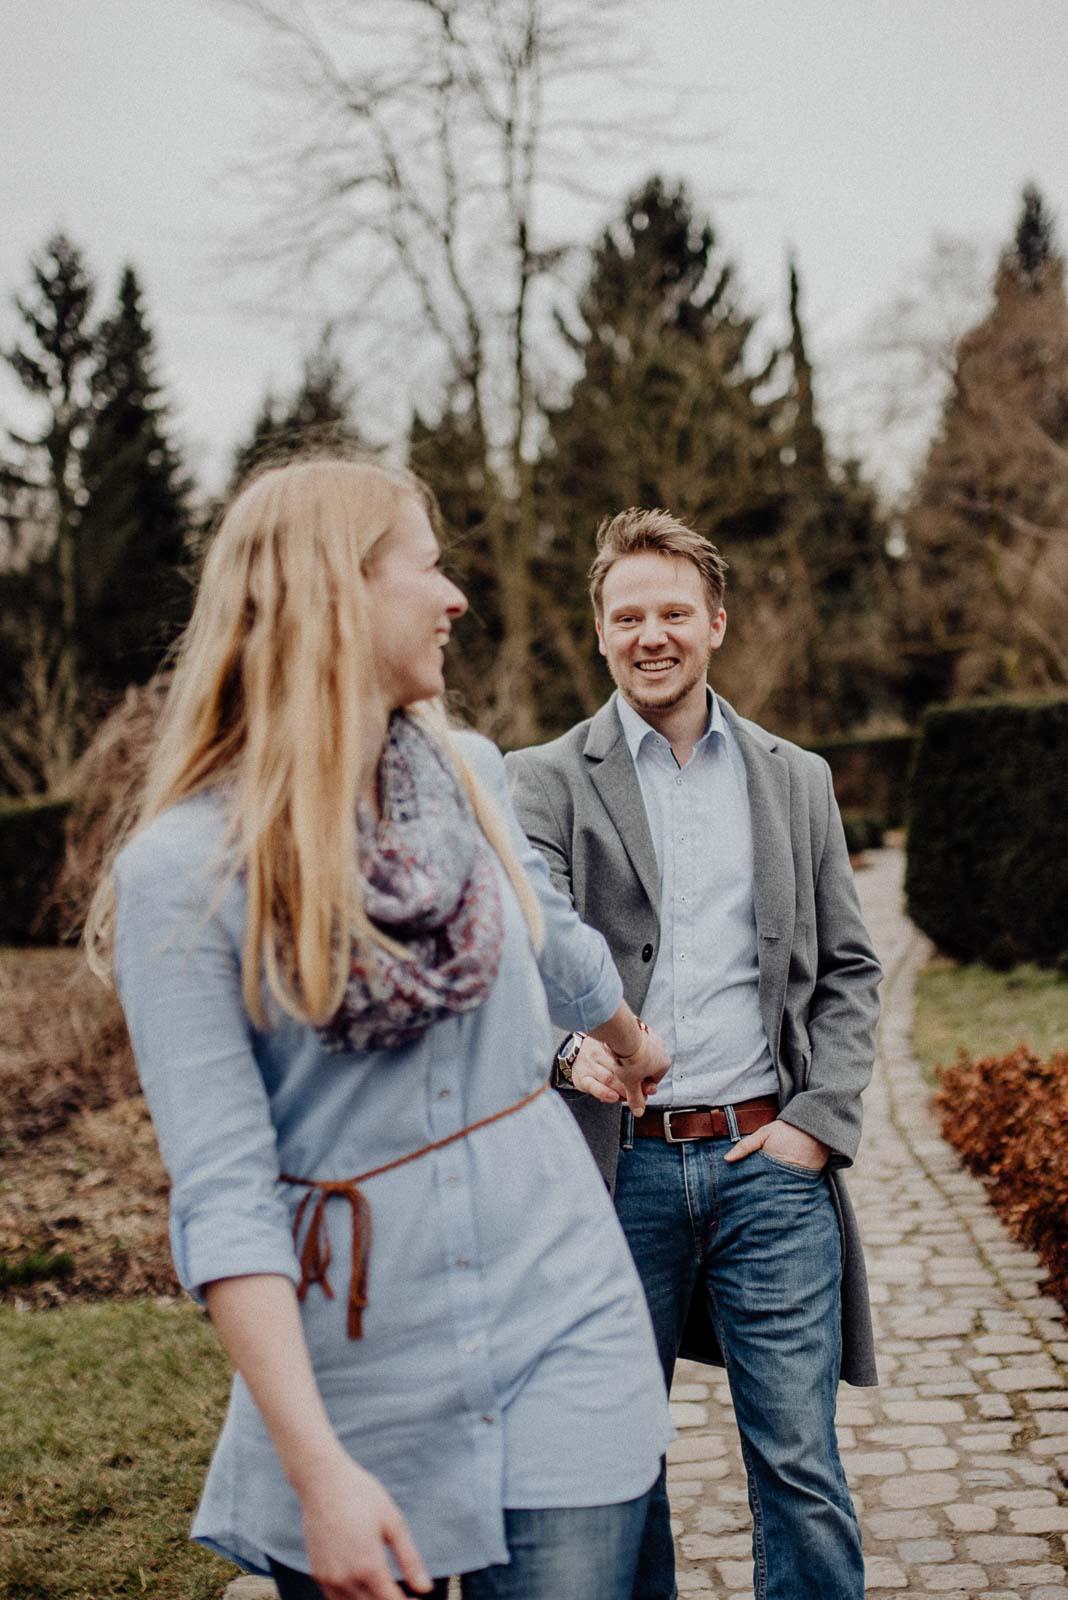 037-verlobungsshooting-engagement-fotograf-witten-rombergpark-dortmund